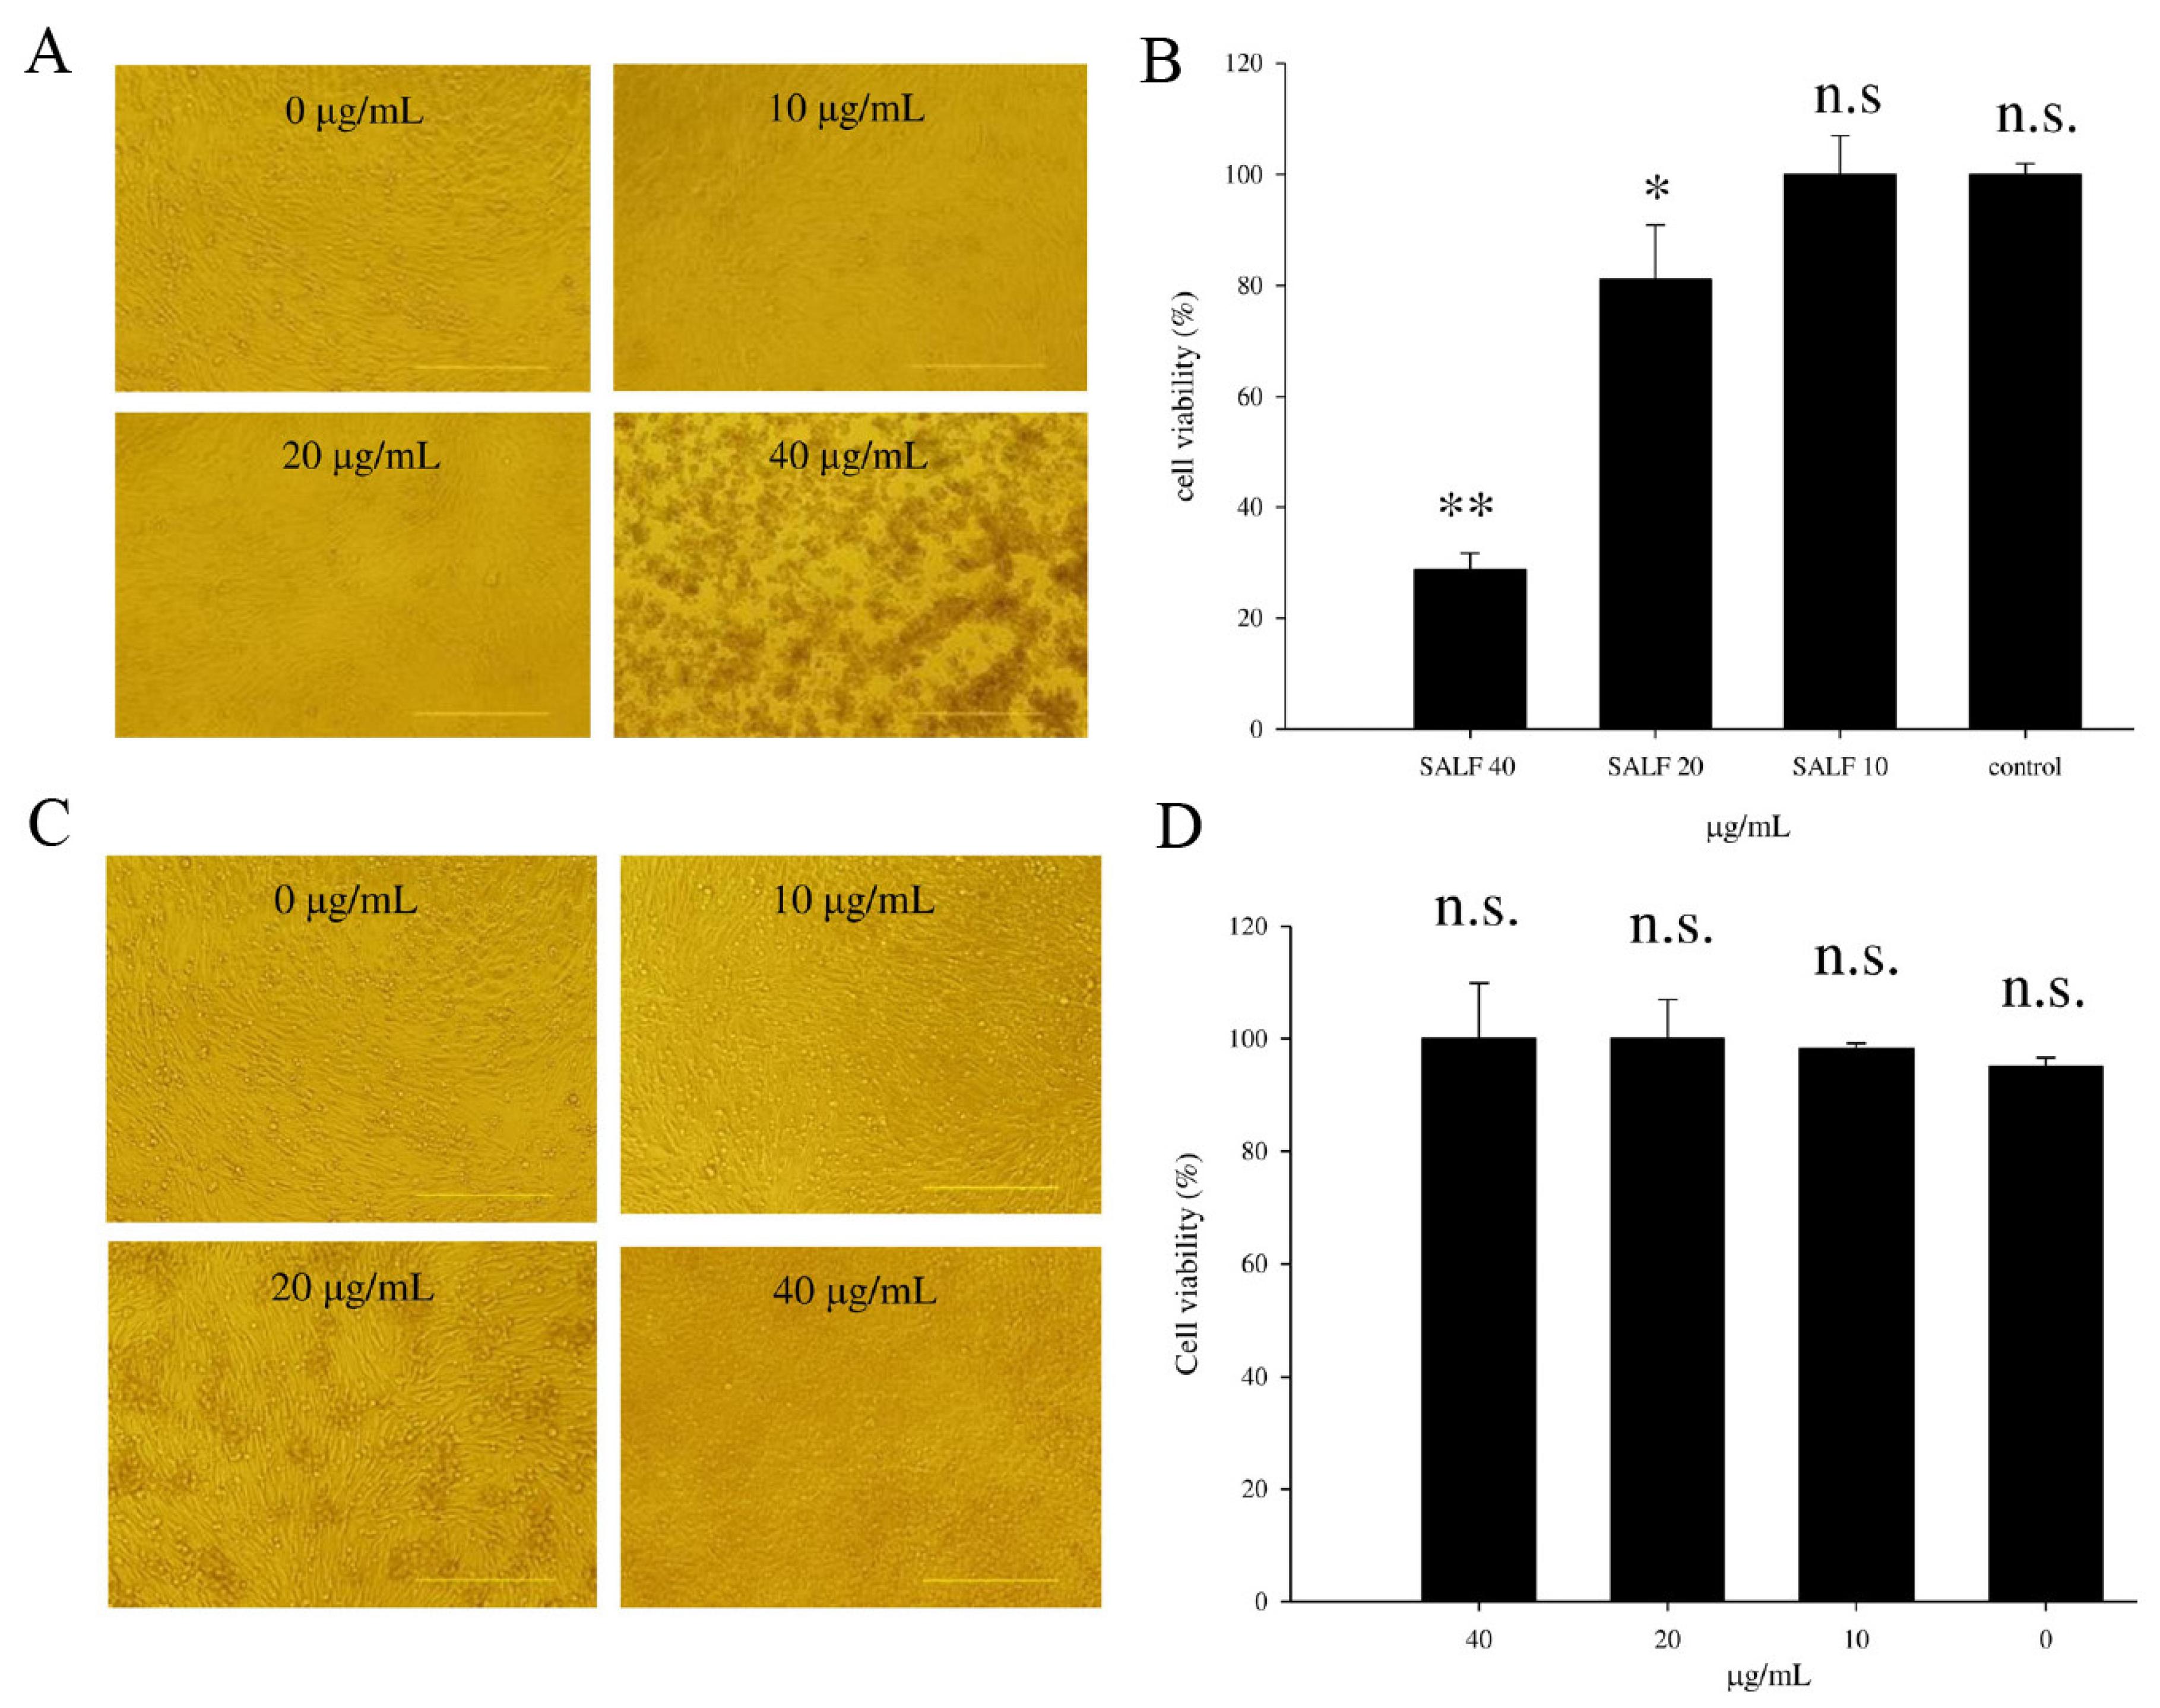 931dab4405d3 Marinedrugs 13 03241 g001. Figure 1. Cytotoxicity of MBT-2 lysate ...